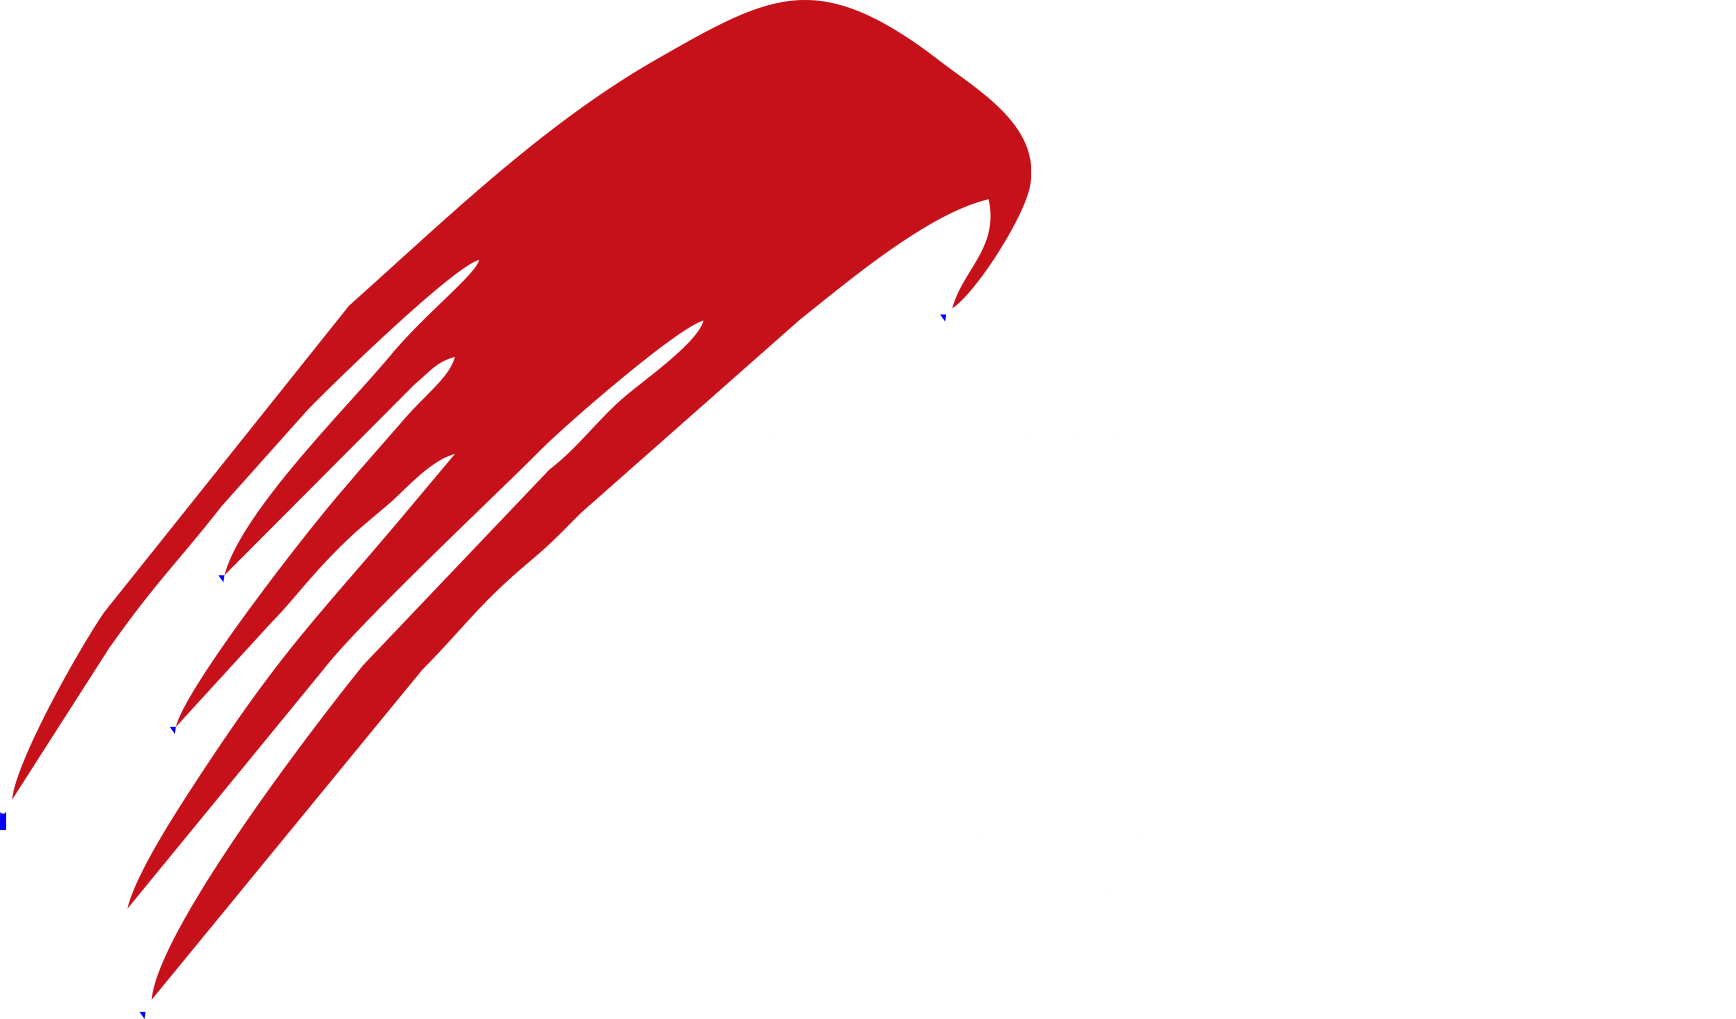 Bahria sports city logo